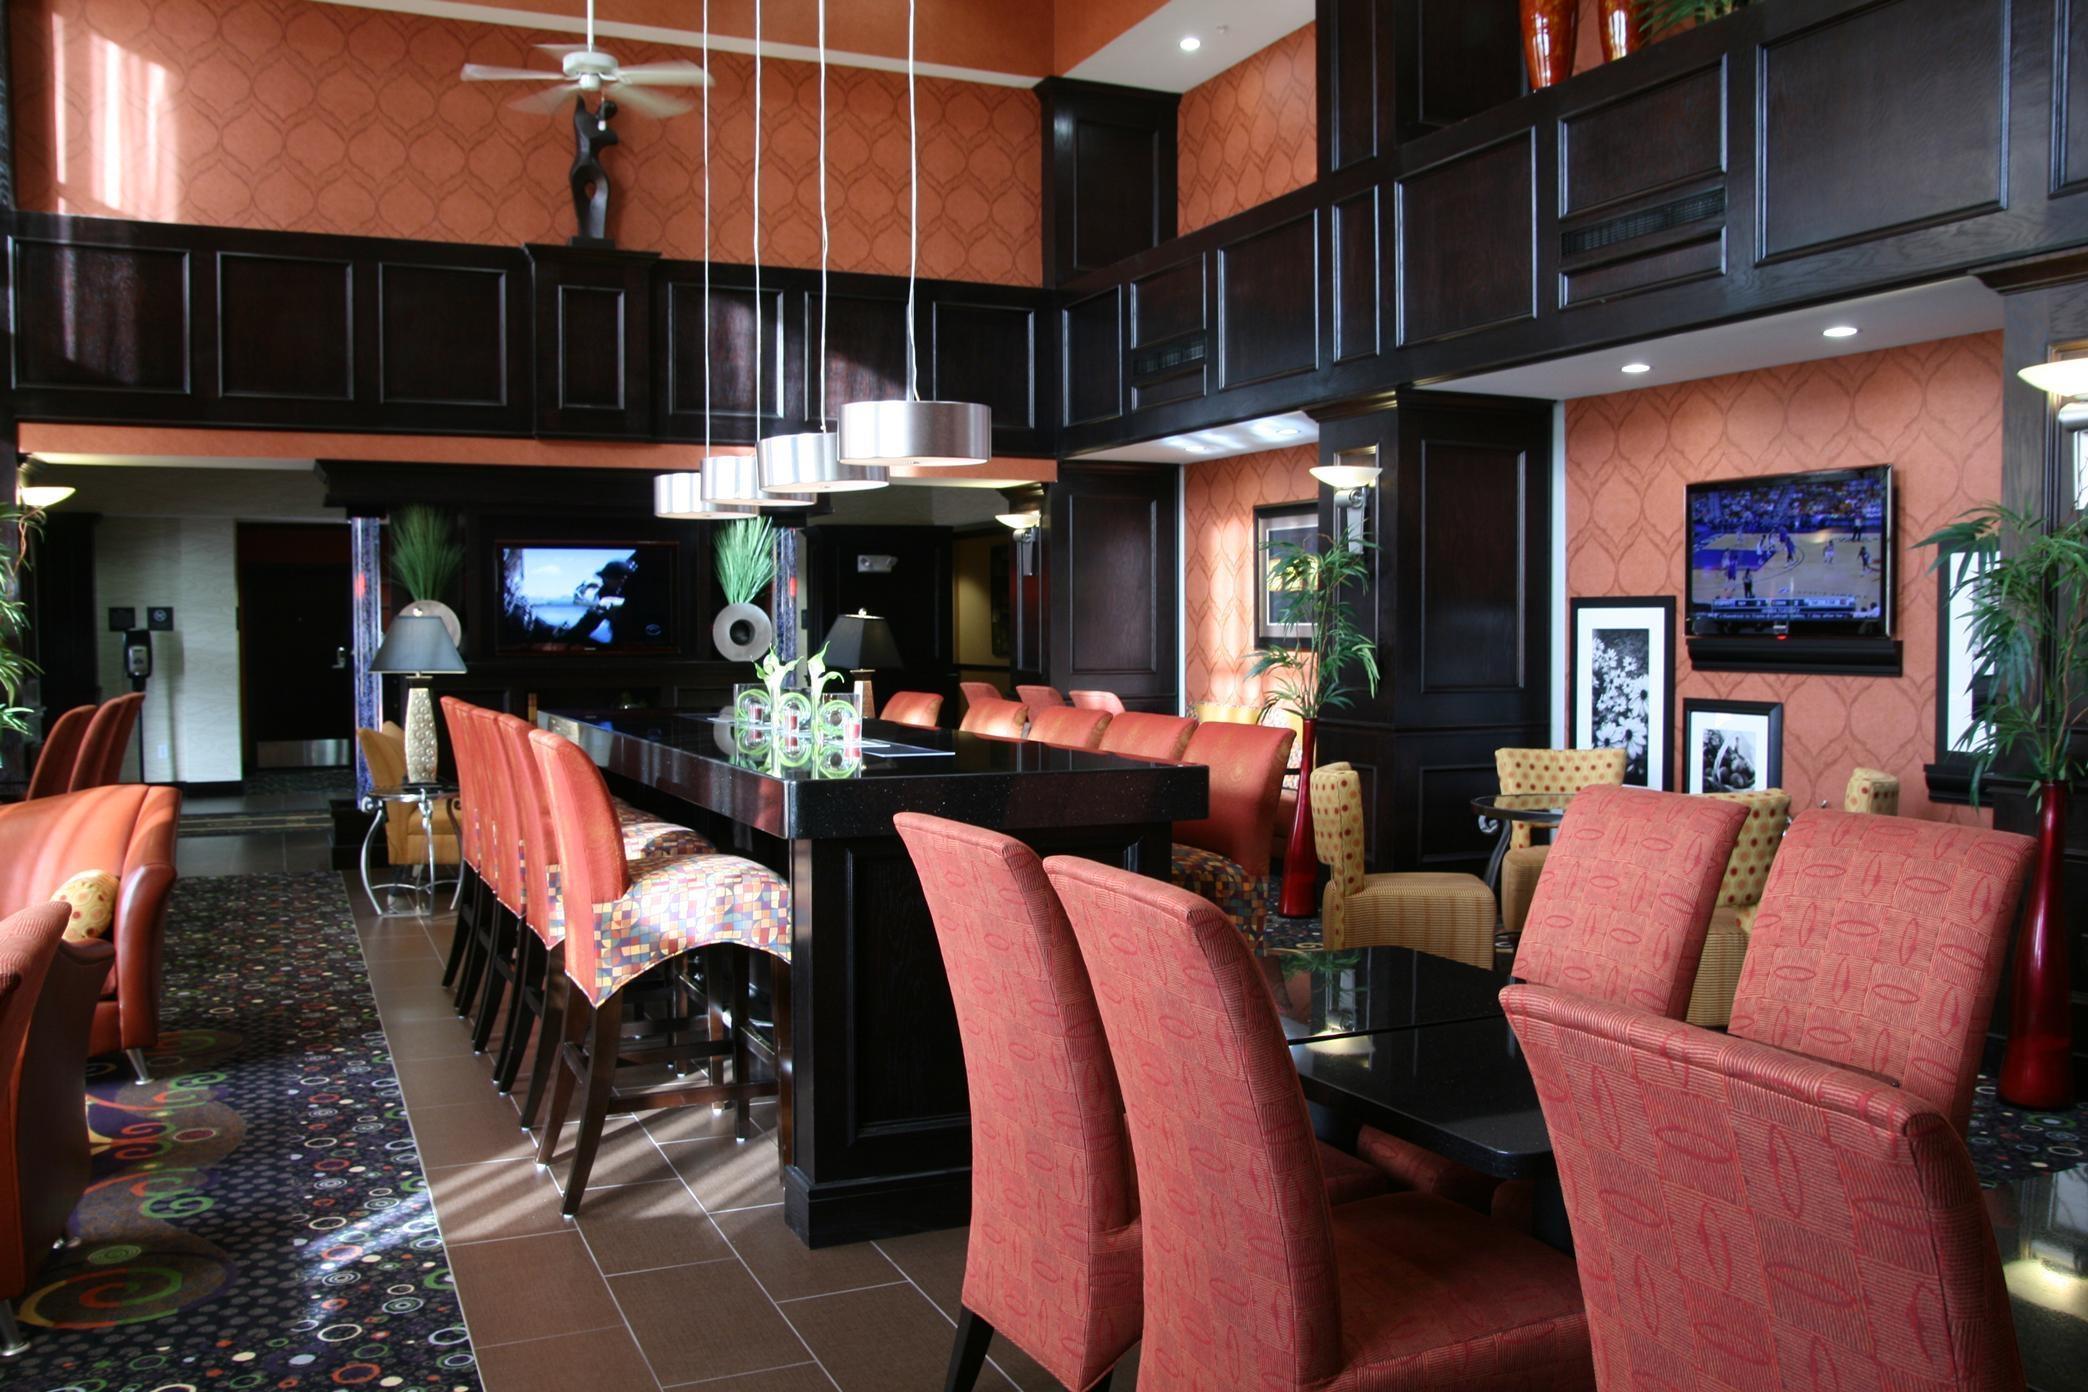 Hampton Inn & Suites Dallas/Lewisville-Vista Ridge Mall, TX image 9